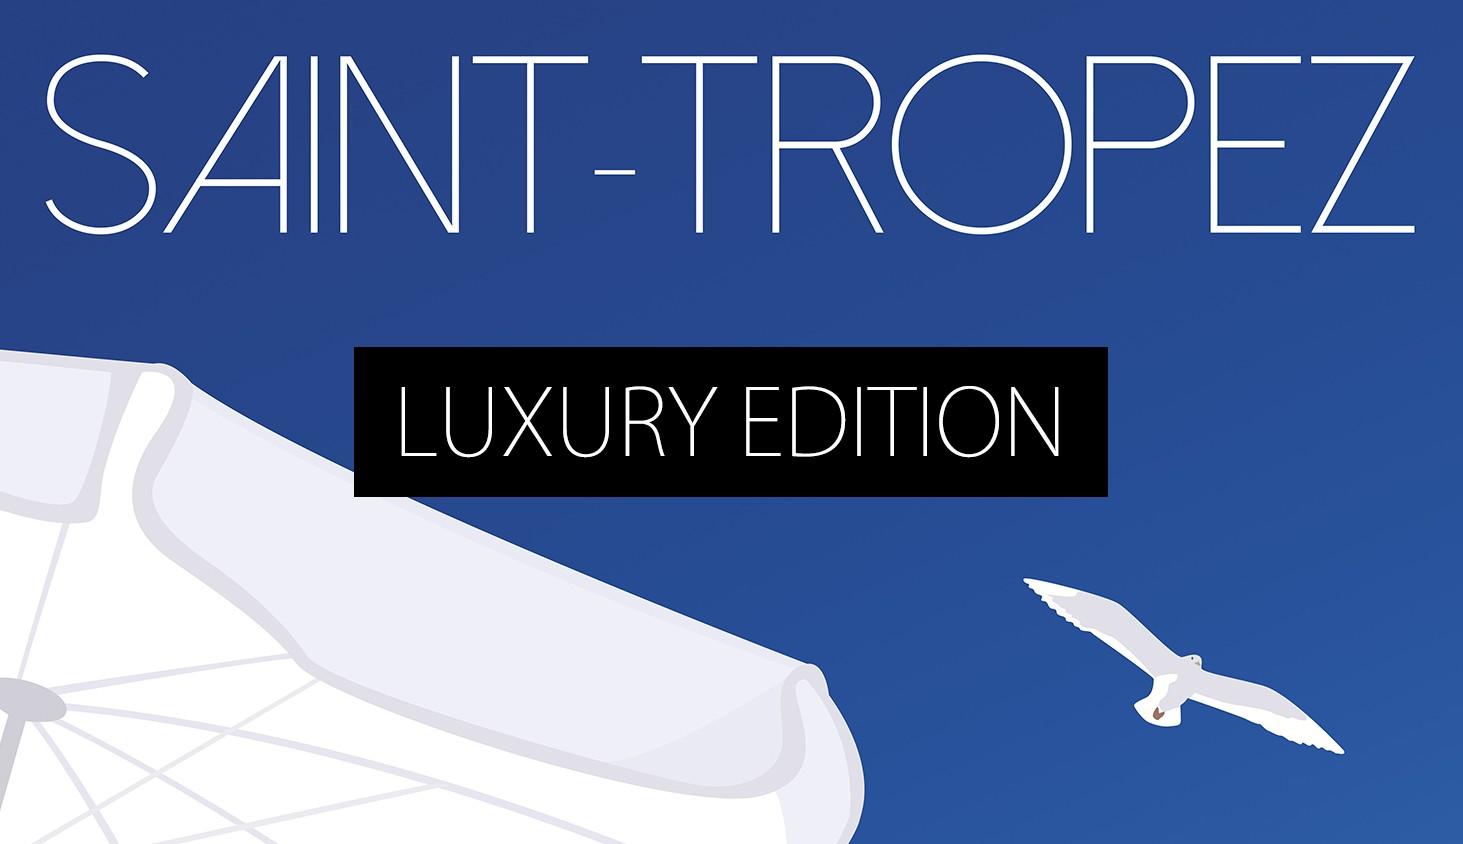 Luxury Collection Saint Tropez